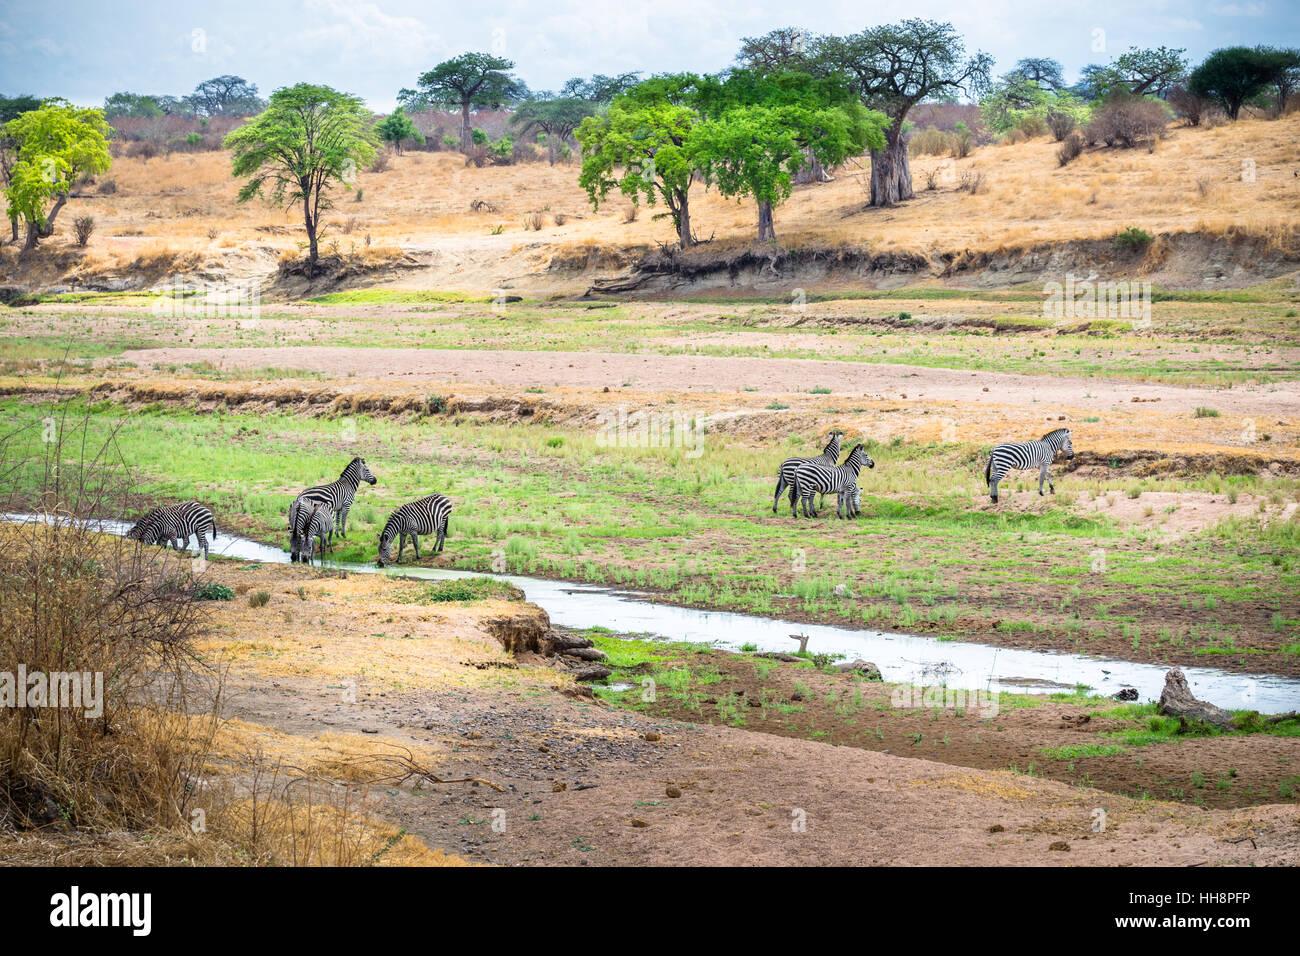 groups of zebras on national park, tanzania, safari - Stock Image